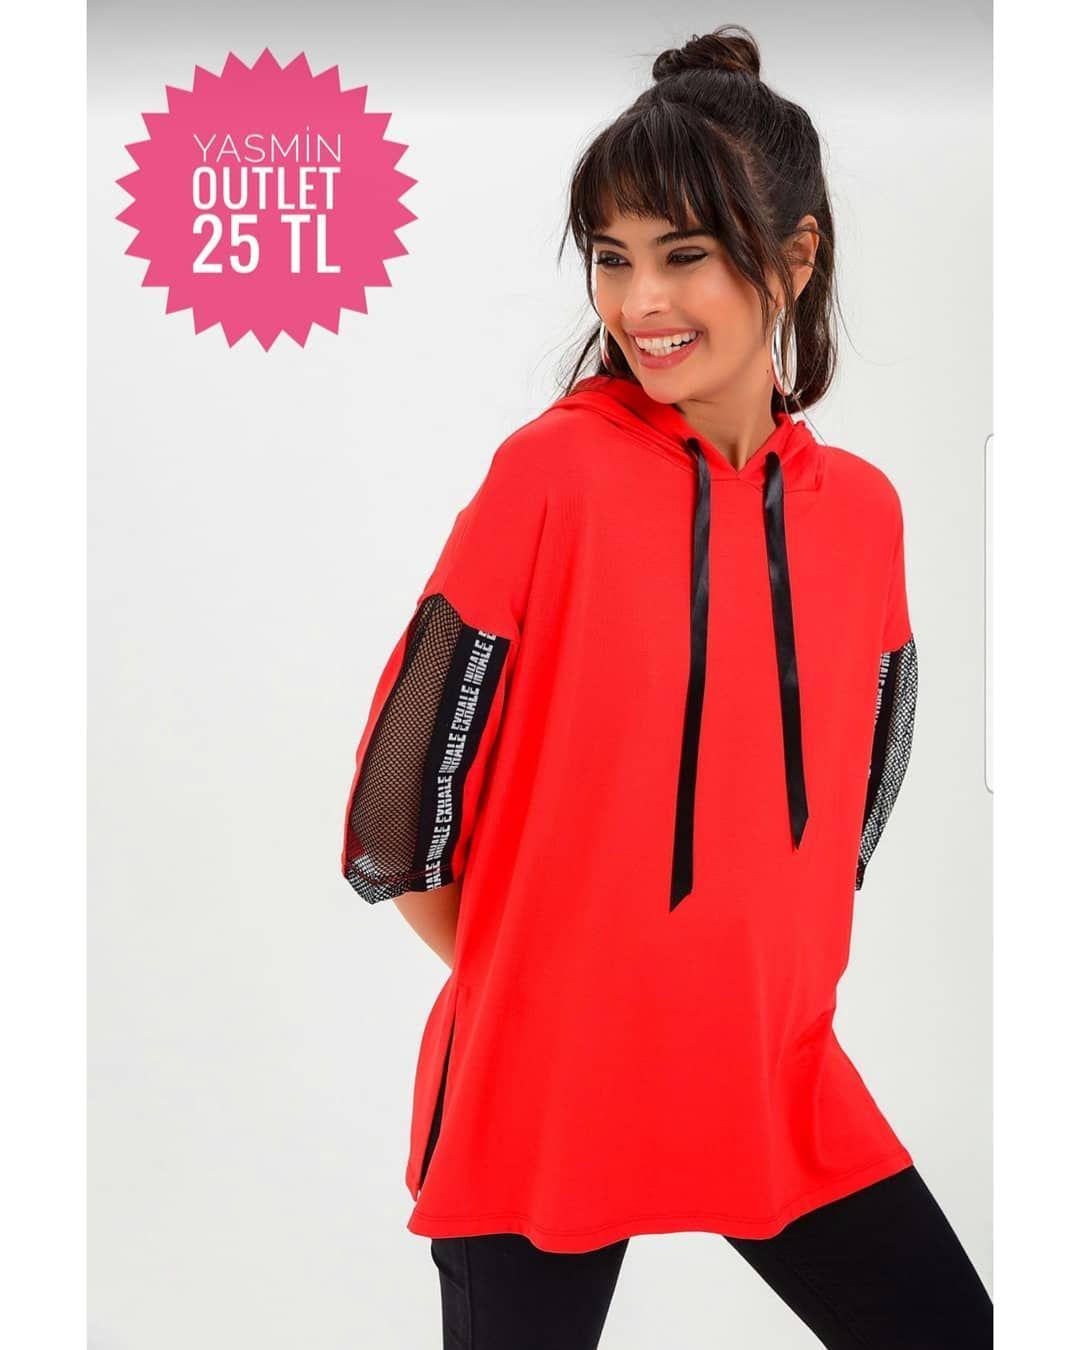 New The 10 Best Fashion With Pictures Kollari Fileli Kapsonlu Tshirt 25 Tl Tarsus Mersin Adana Newseason Bayangiyim Women Moda Elbise Modelleri Elbise